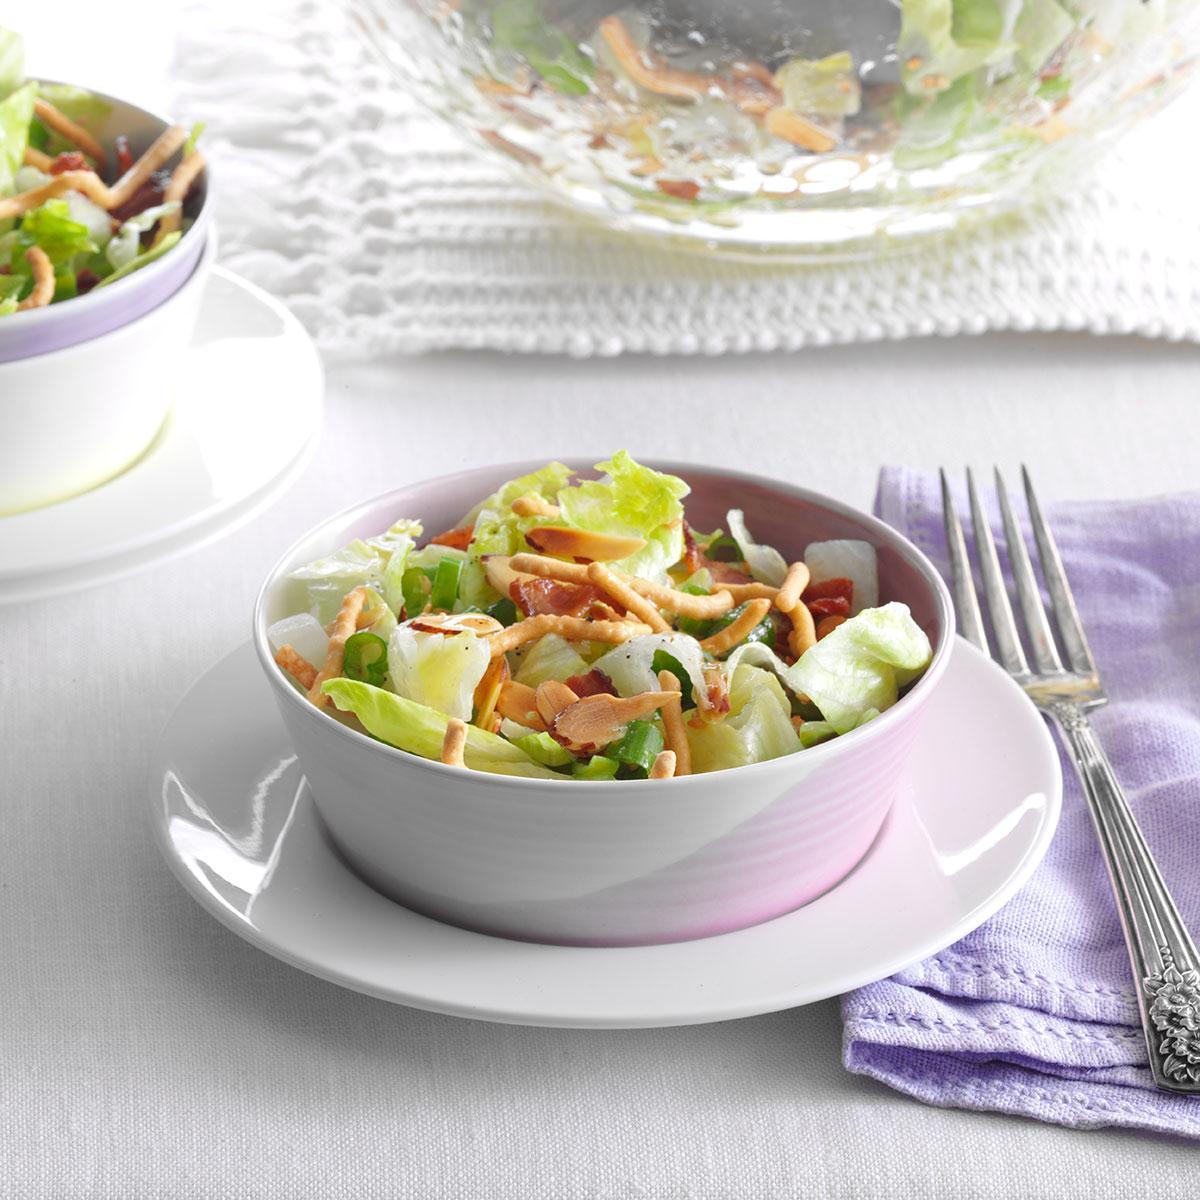 Crunchy Tossed Salad image